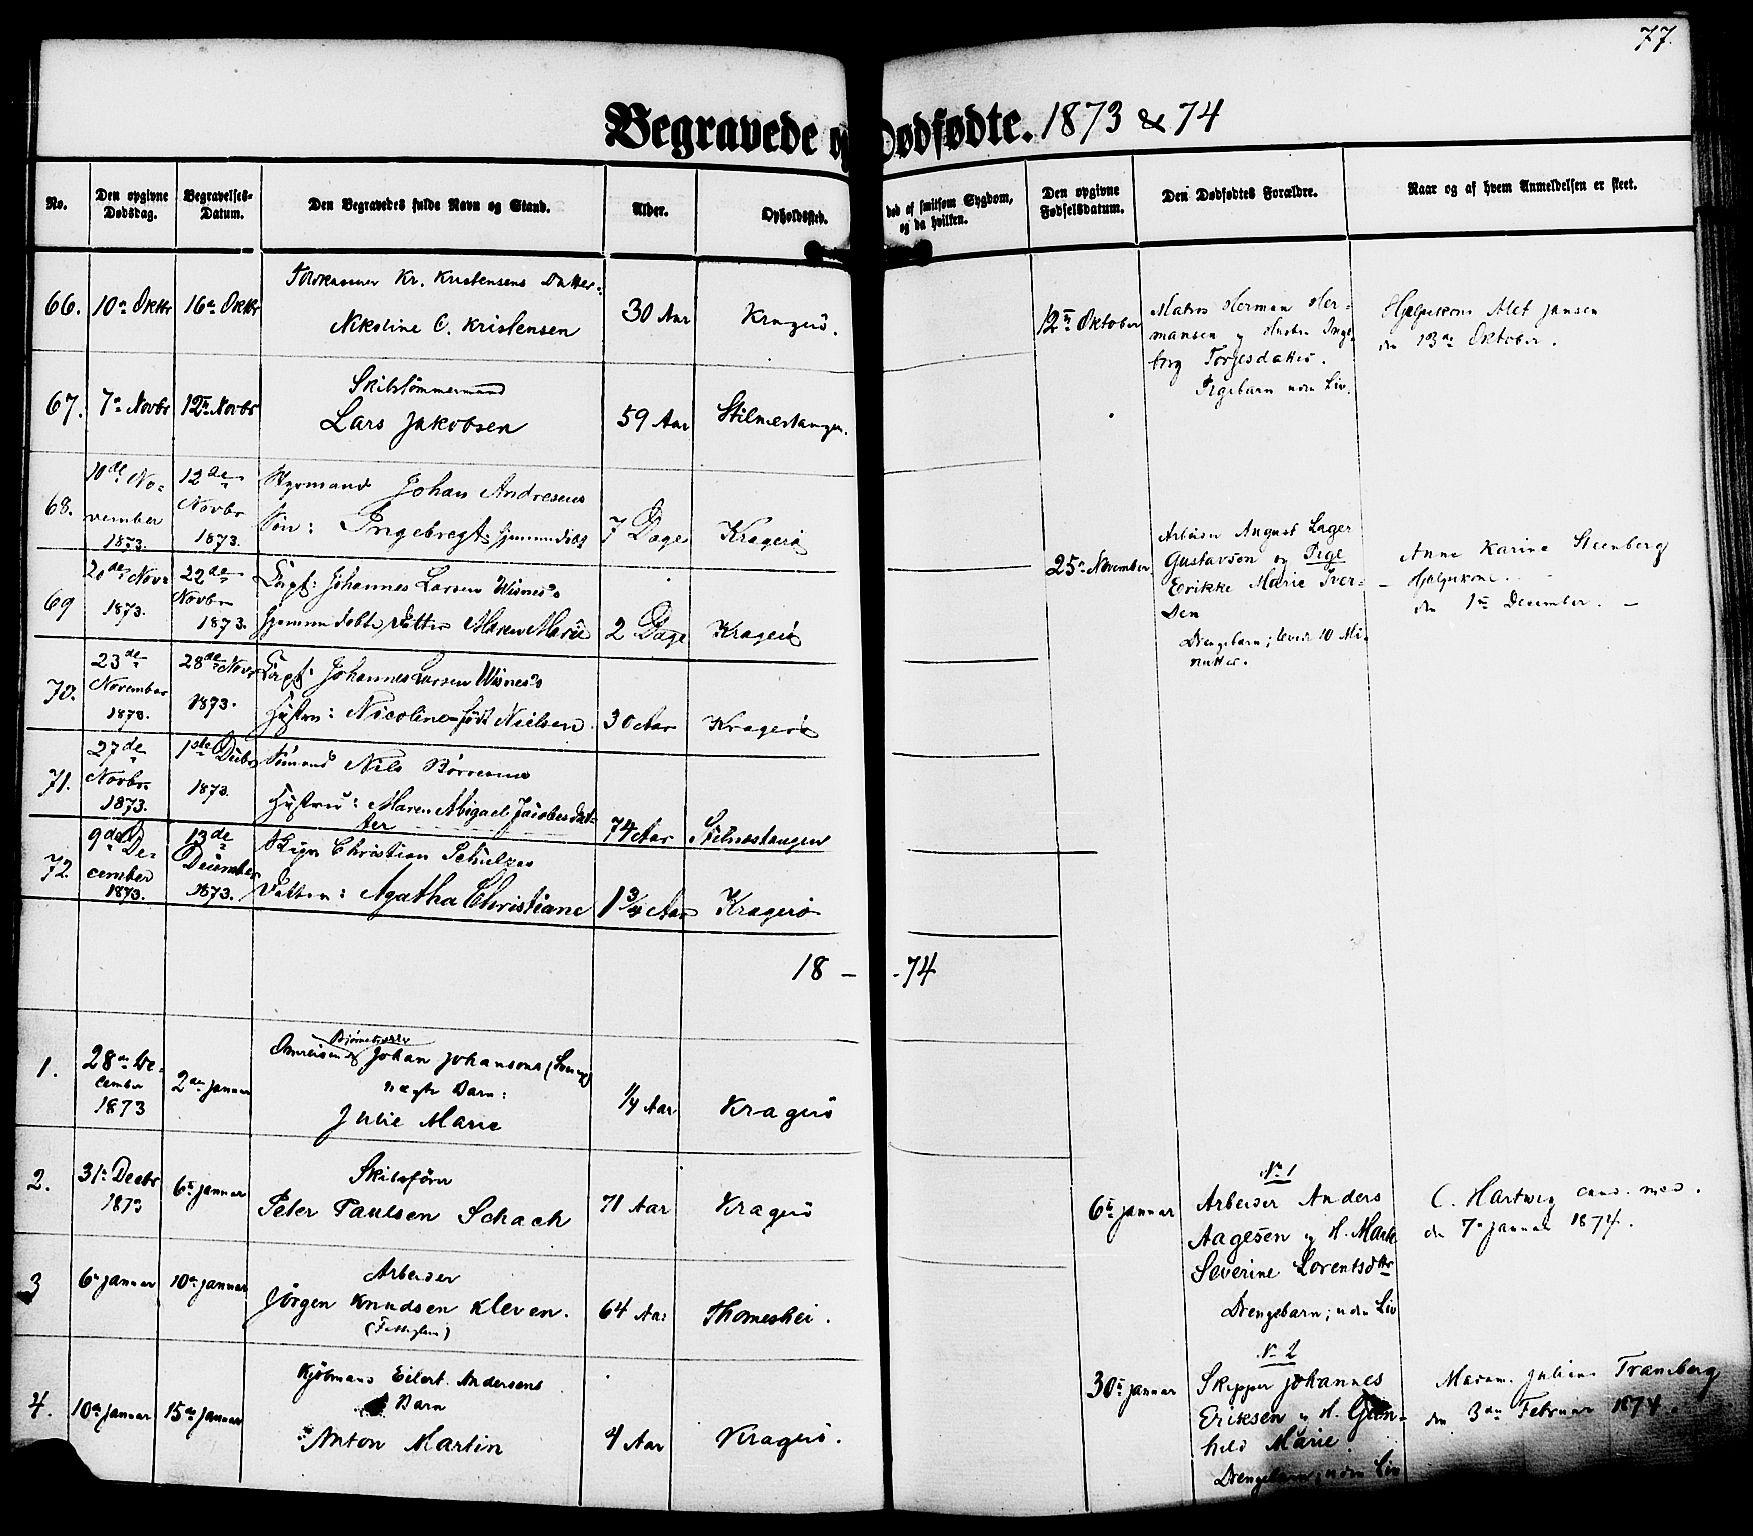 SAKO, Kragerø kirkebøker, F/Fa/L0010: Ministerialbok nr. 10, 1861-1885, s. 77